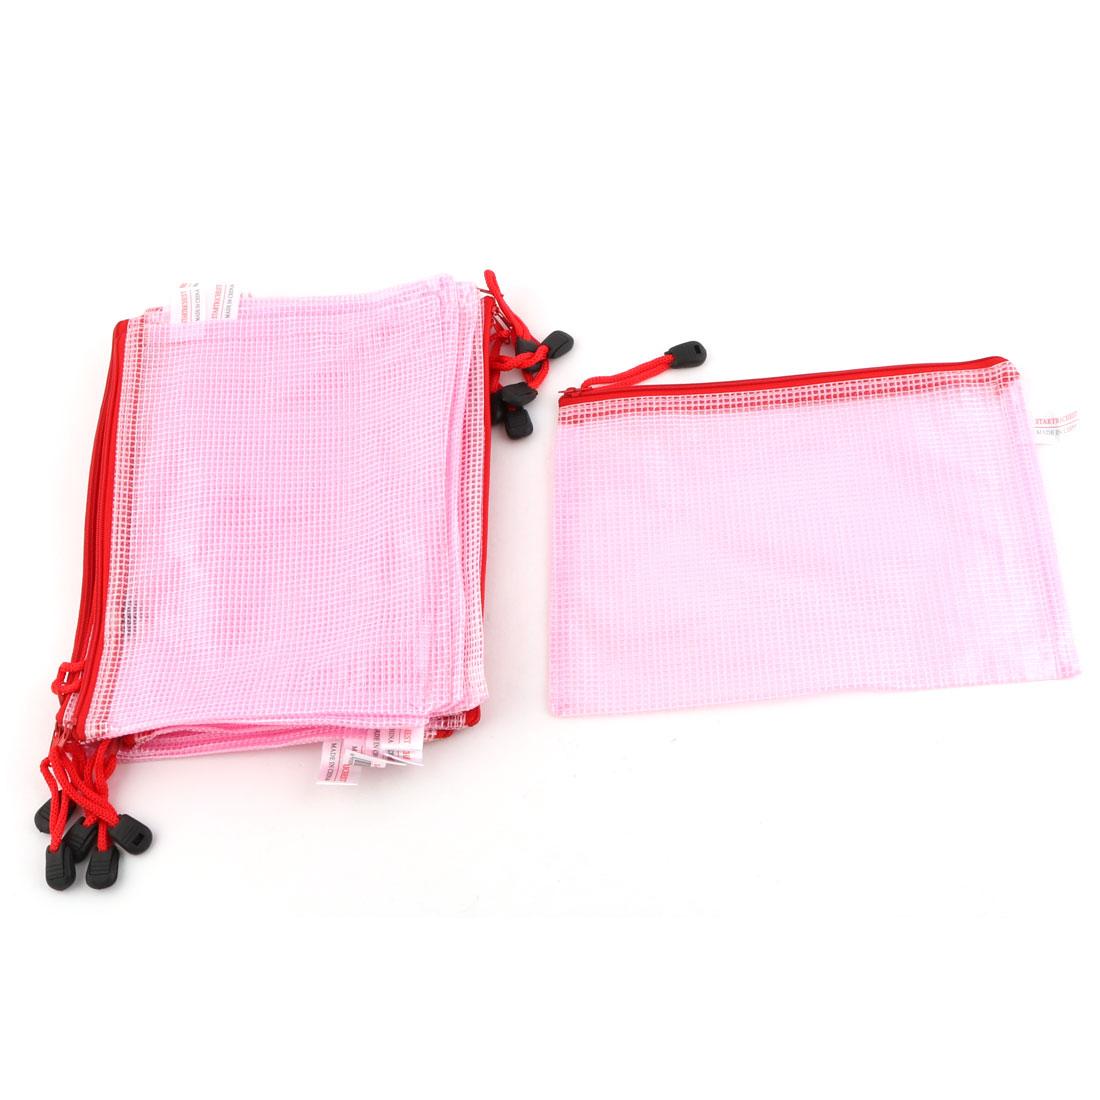 Office School Netting Surface Zipper Closure A5 Document File Bag Holder Pink 12 Pcs